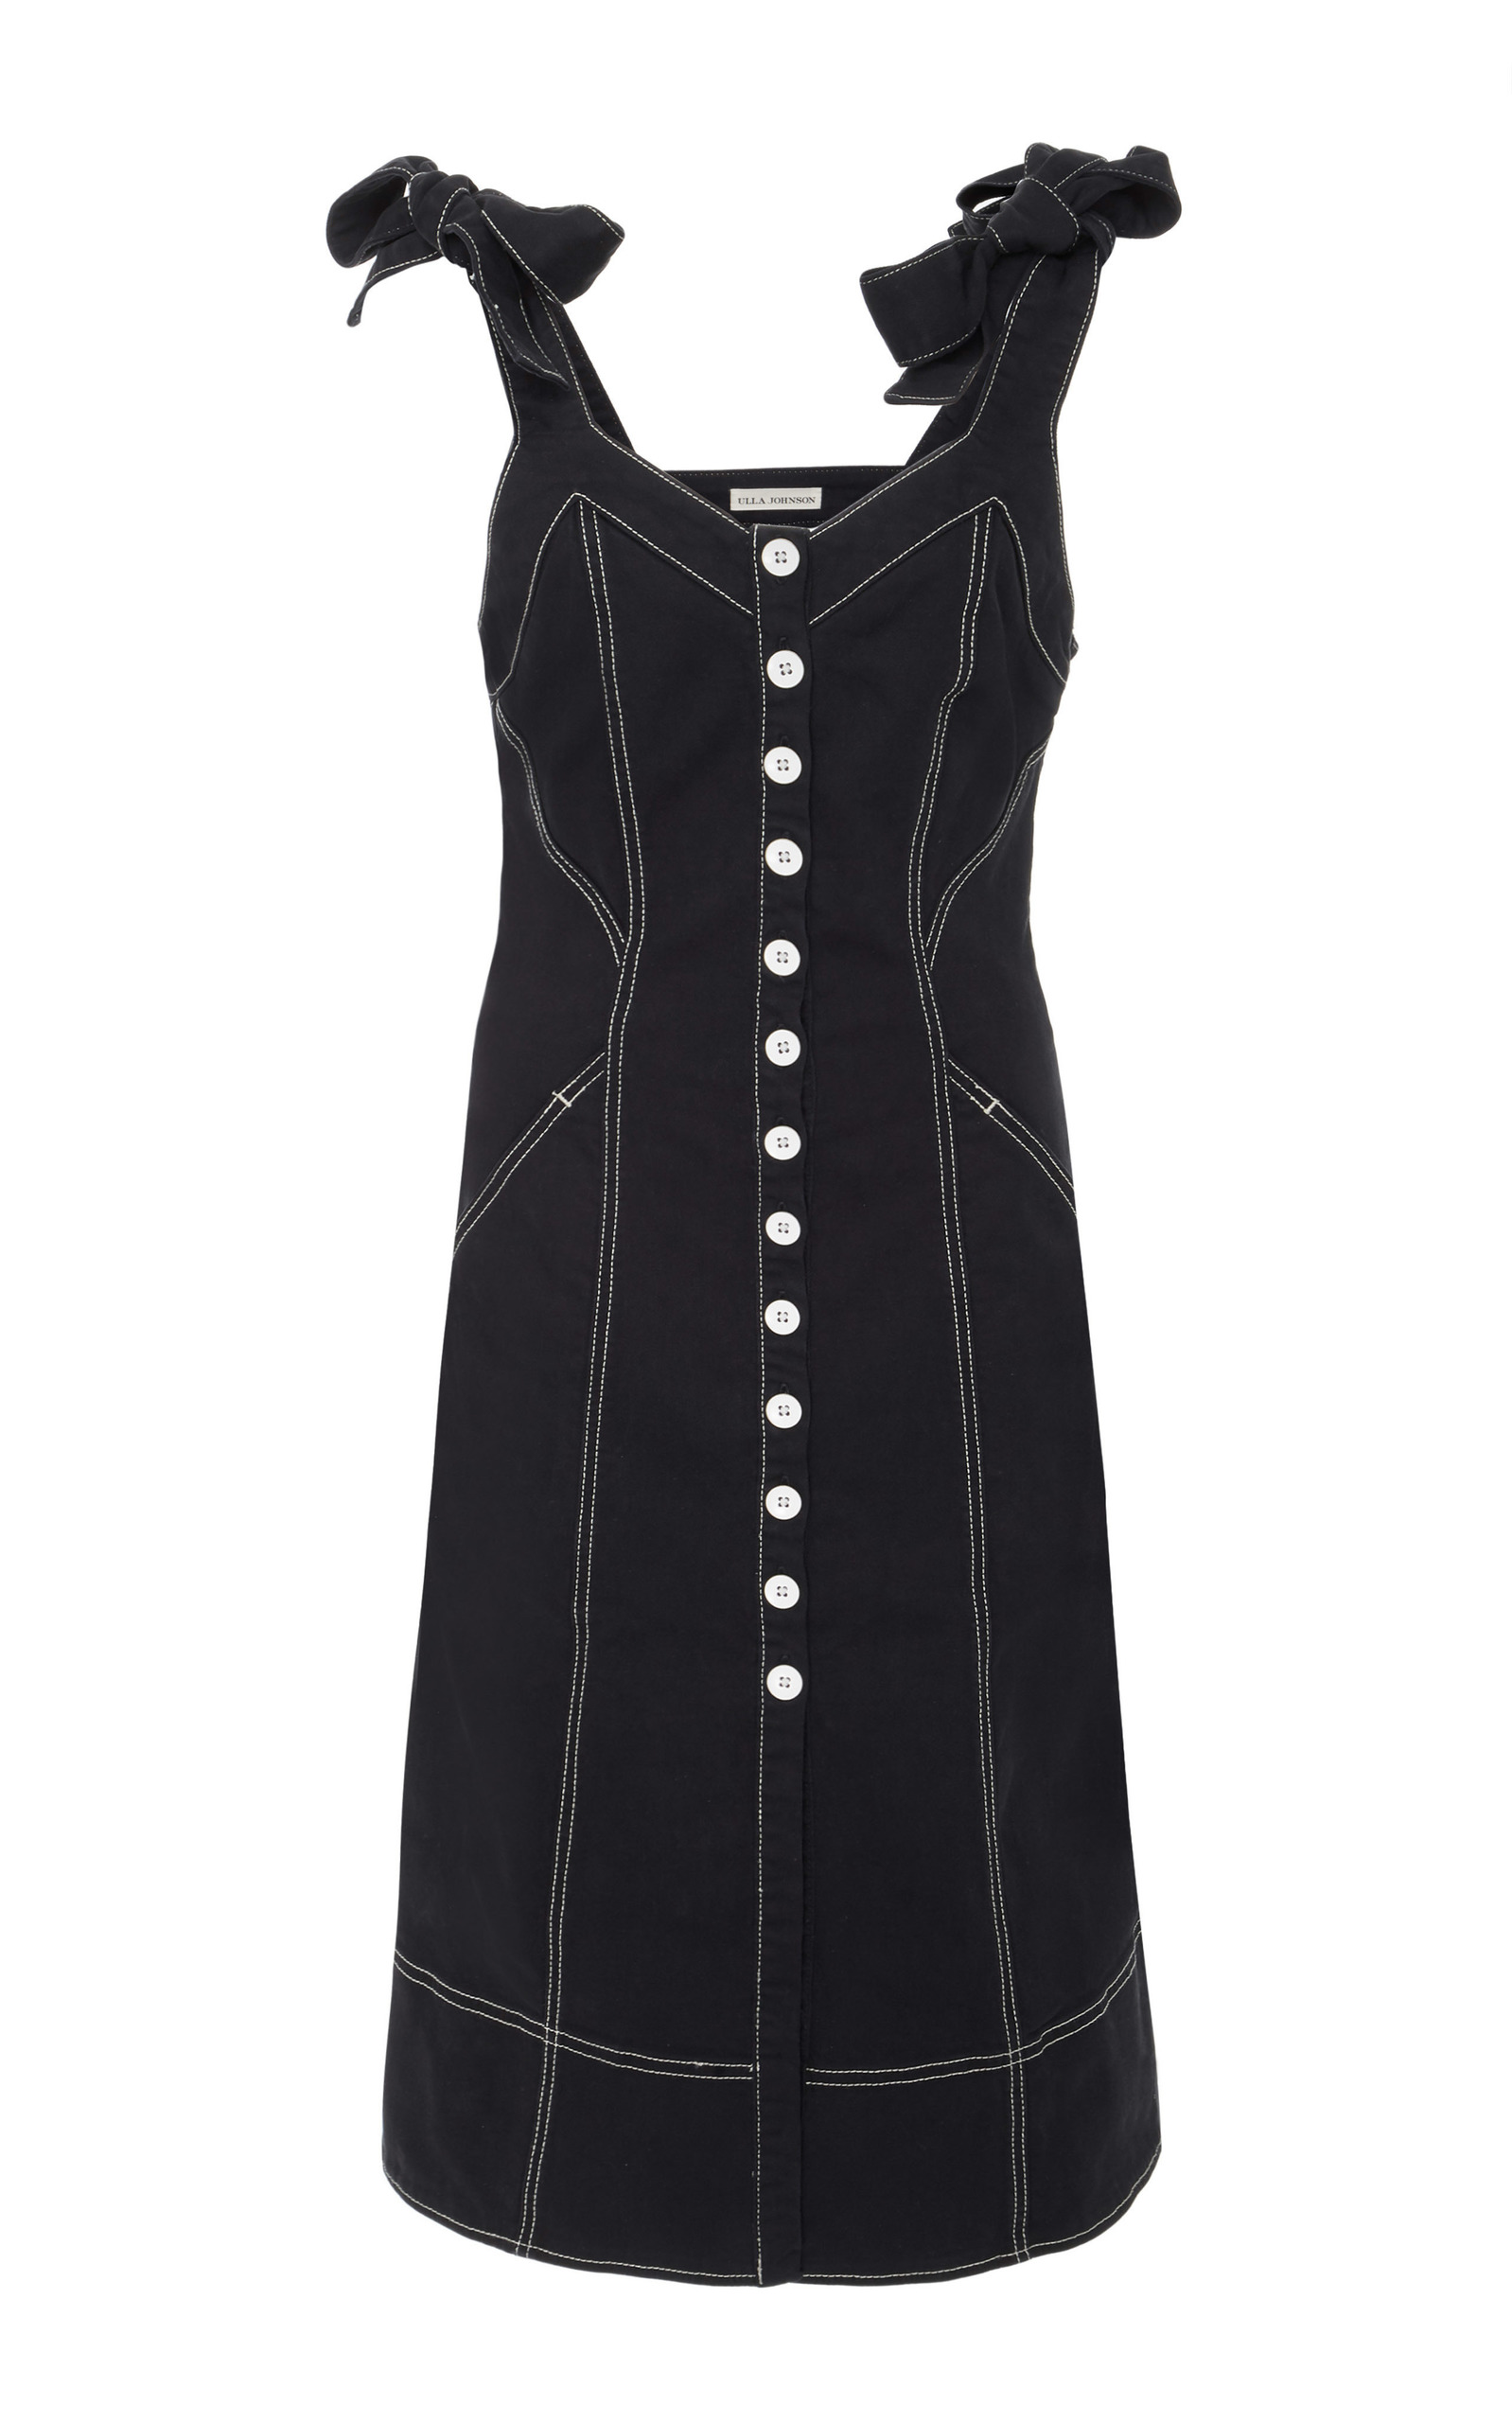 0f9480bcecc Ulla JohnsonEmory Tailored Shoulder Tie Denim Dress. CLOSE. Loading